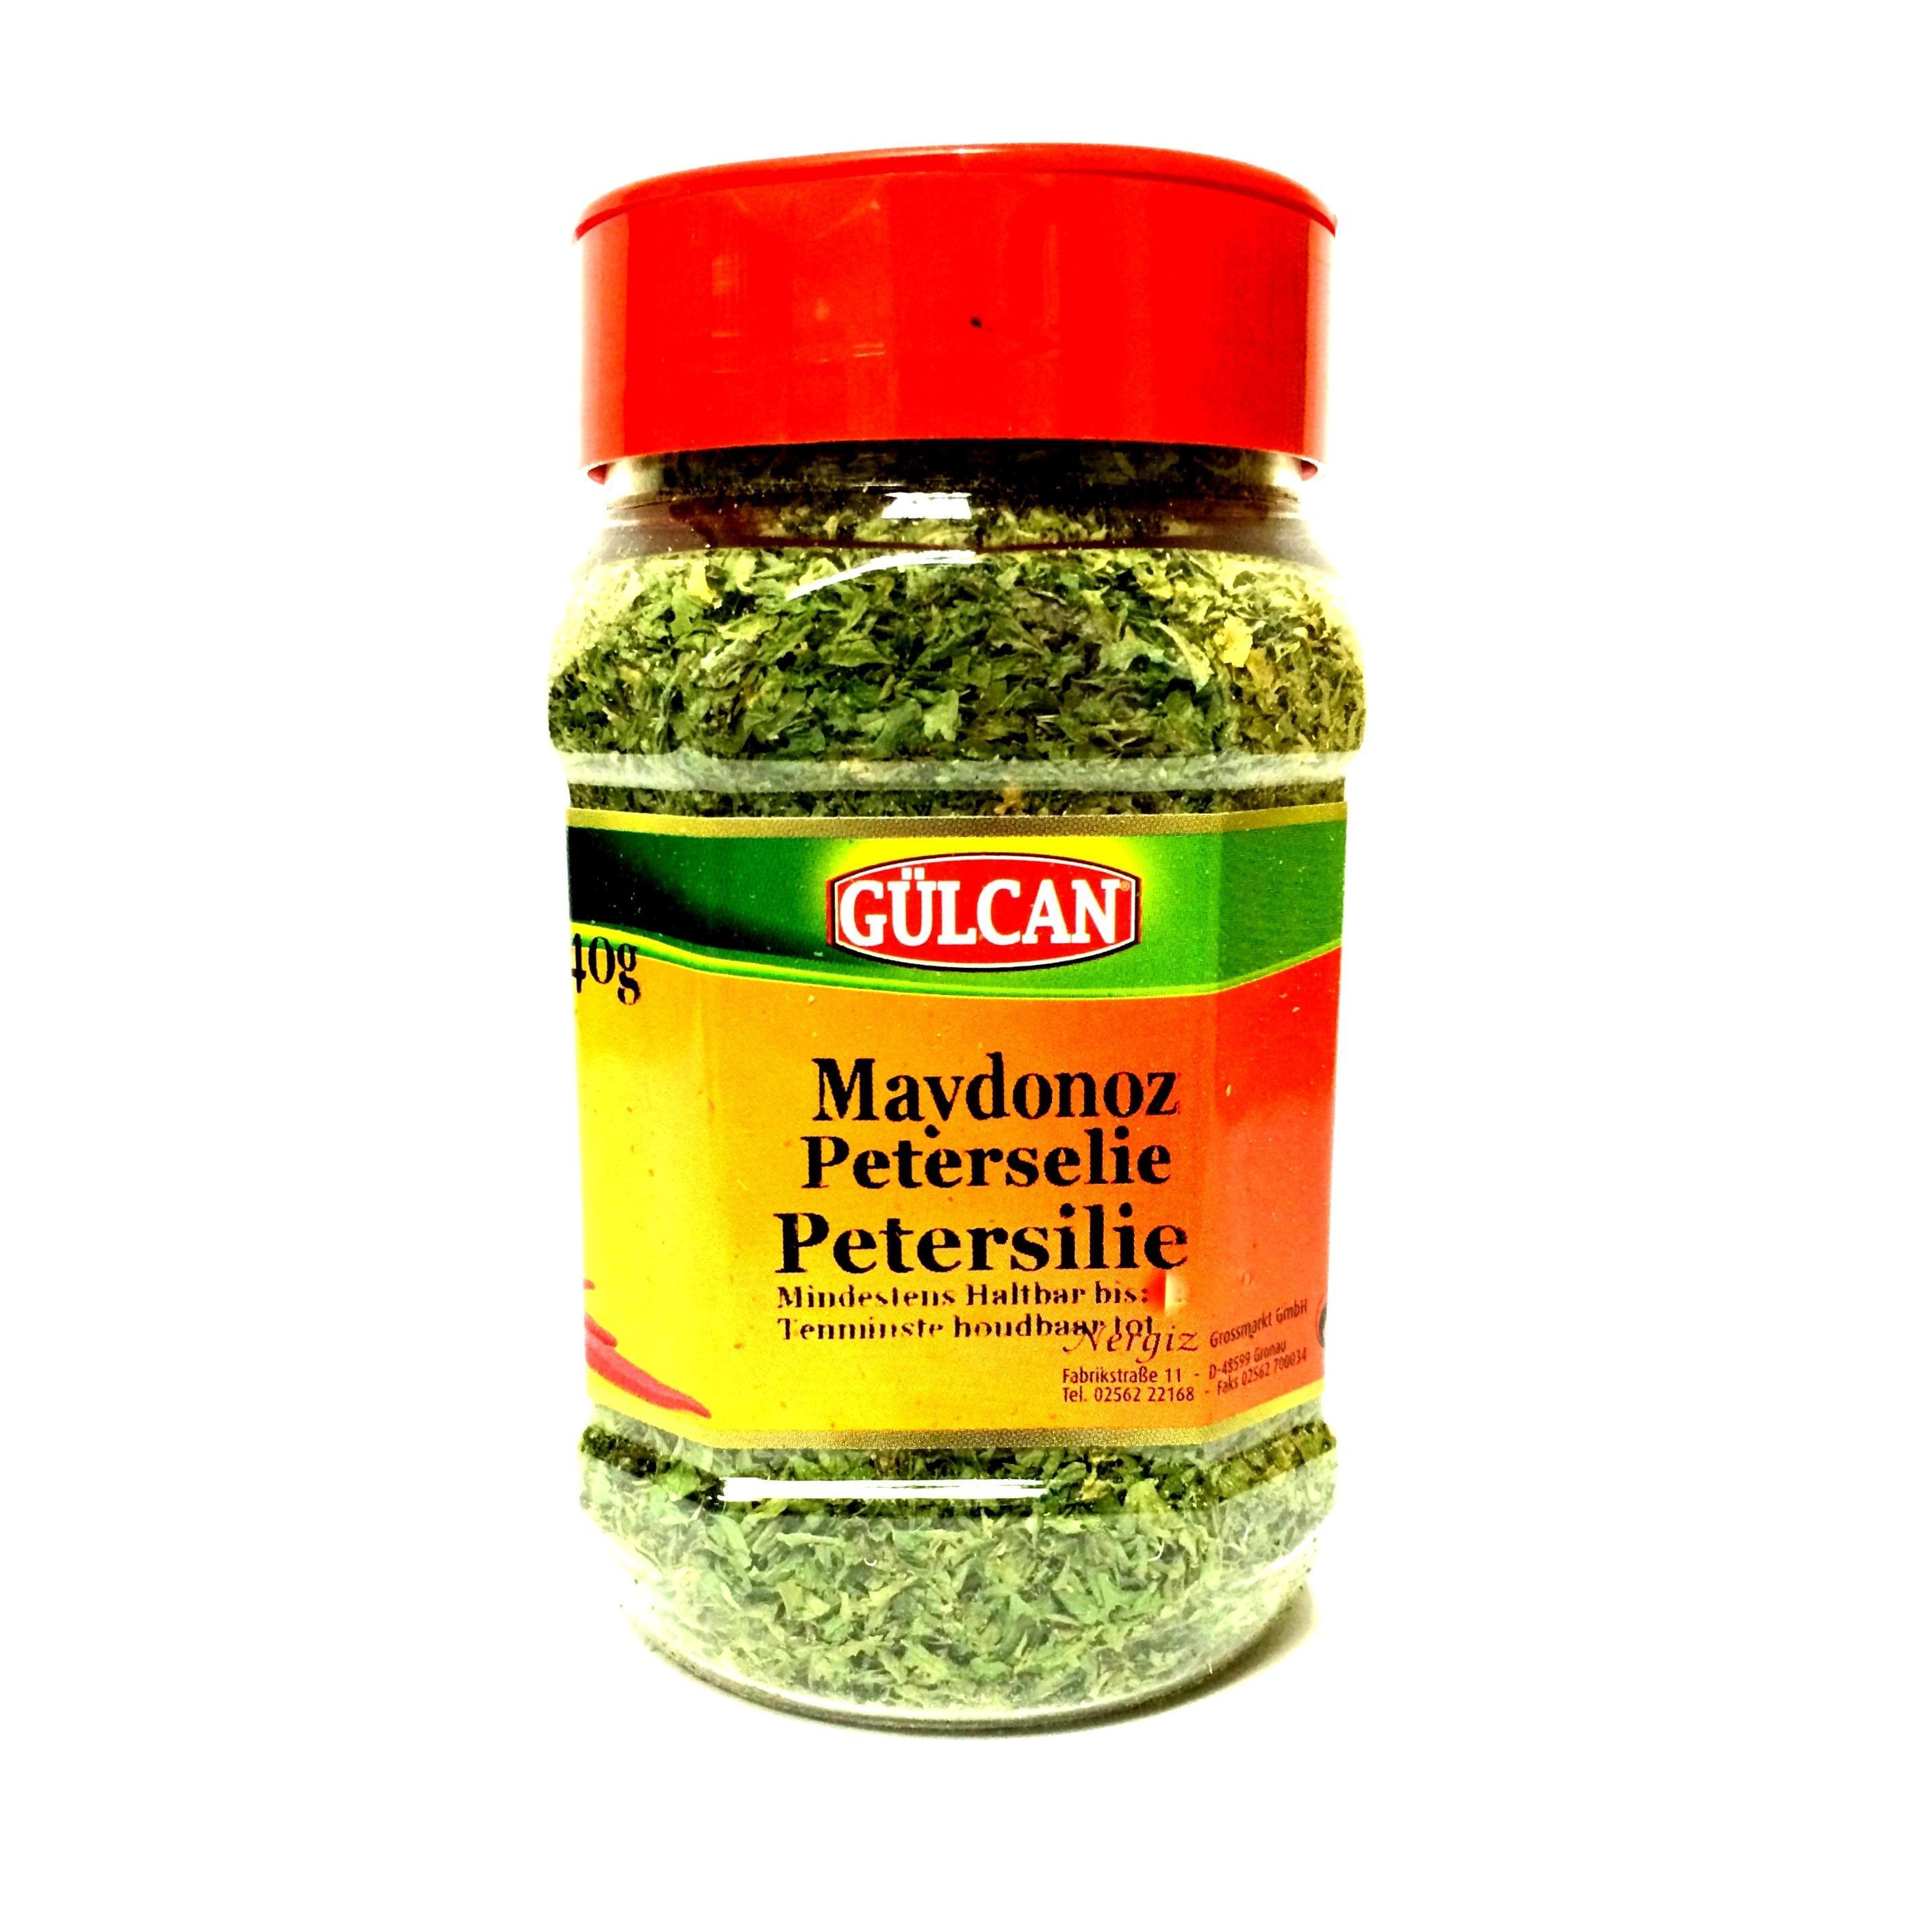 Gülcan Petersilie glatt (getrocknet) 40g